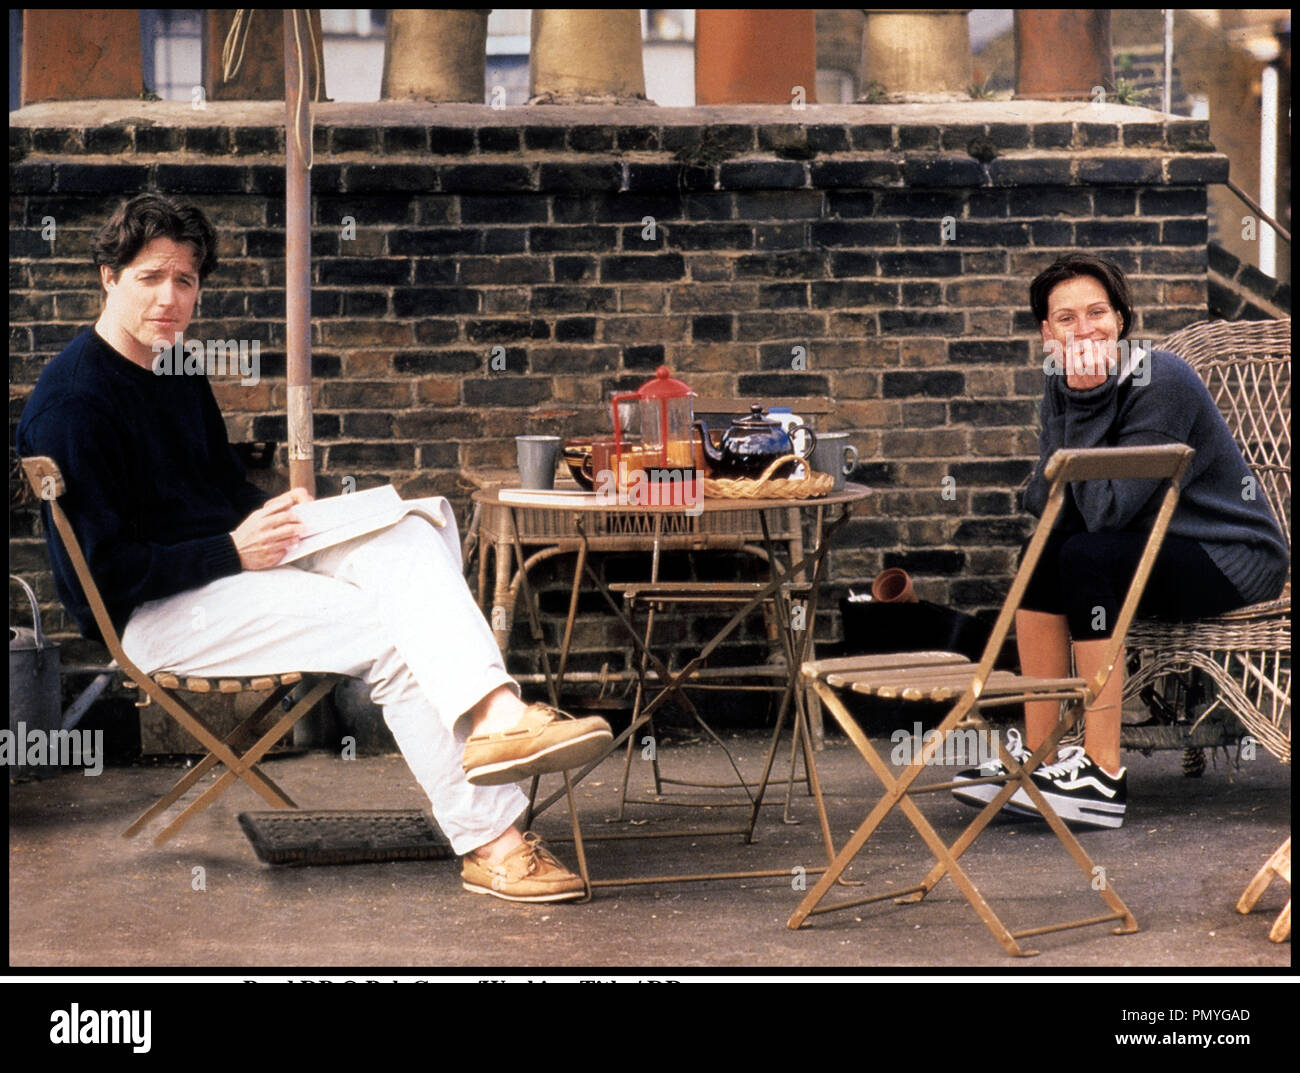 Prod DB © PolyGram/Working Title / DR COUP DE FOUDRE A NOTTING HILL (NOTTING HILL) de Roger Michell 1999 GB avec Hugh Grant et Julia Roberts petit dŽjeuner, toit - Stock Image